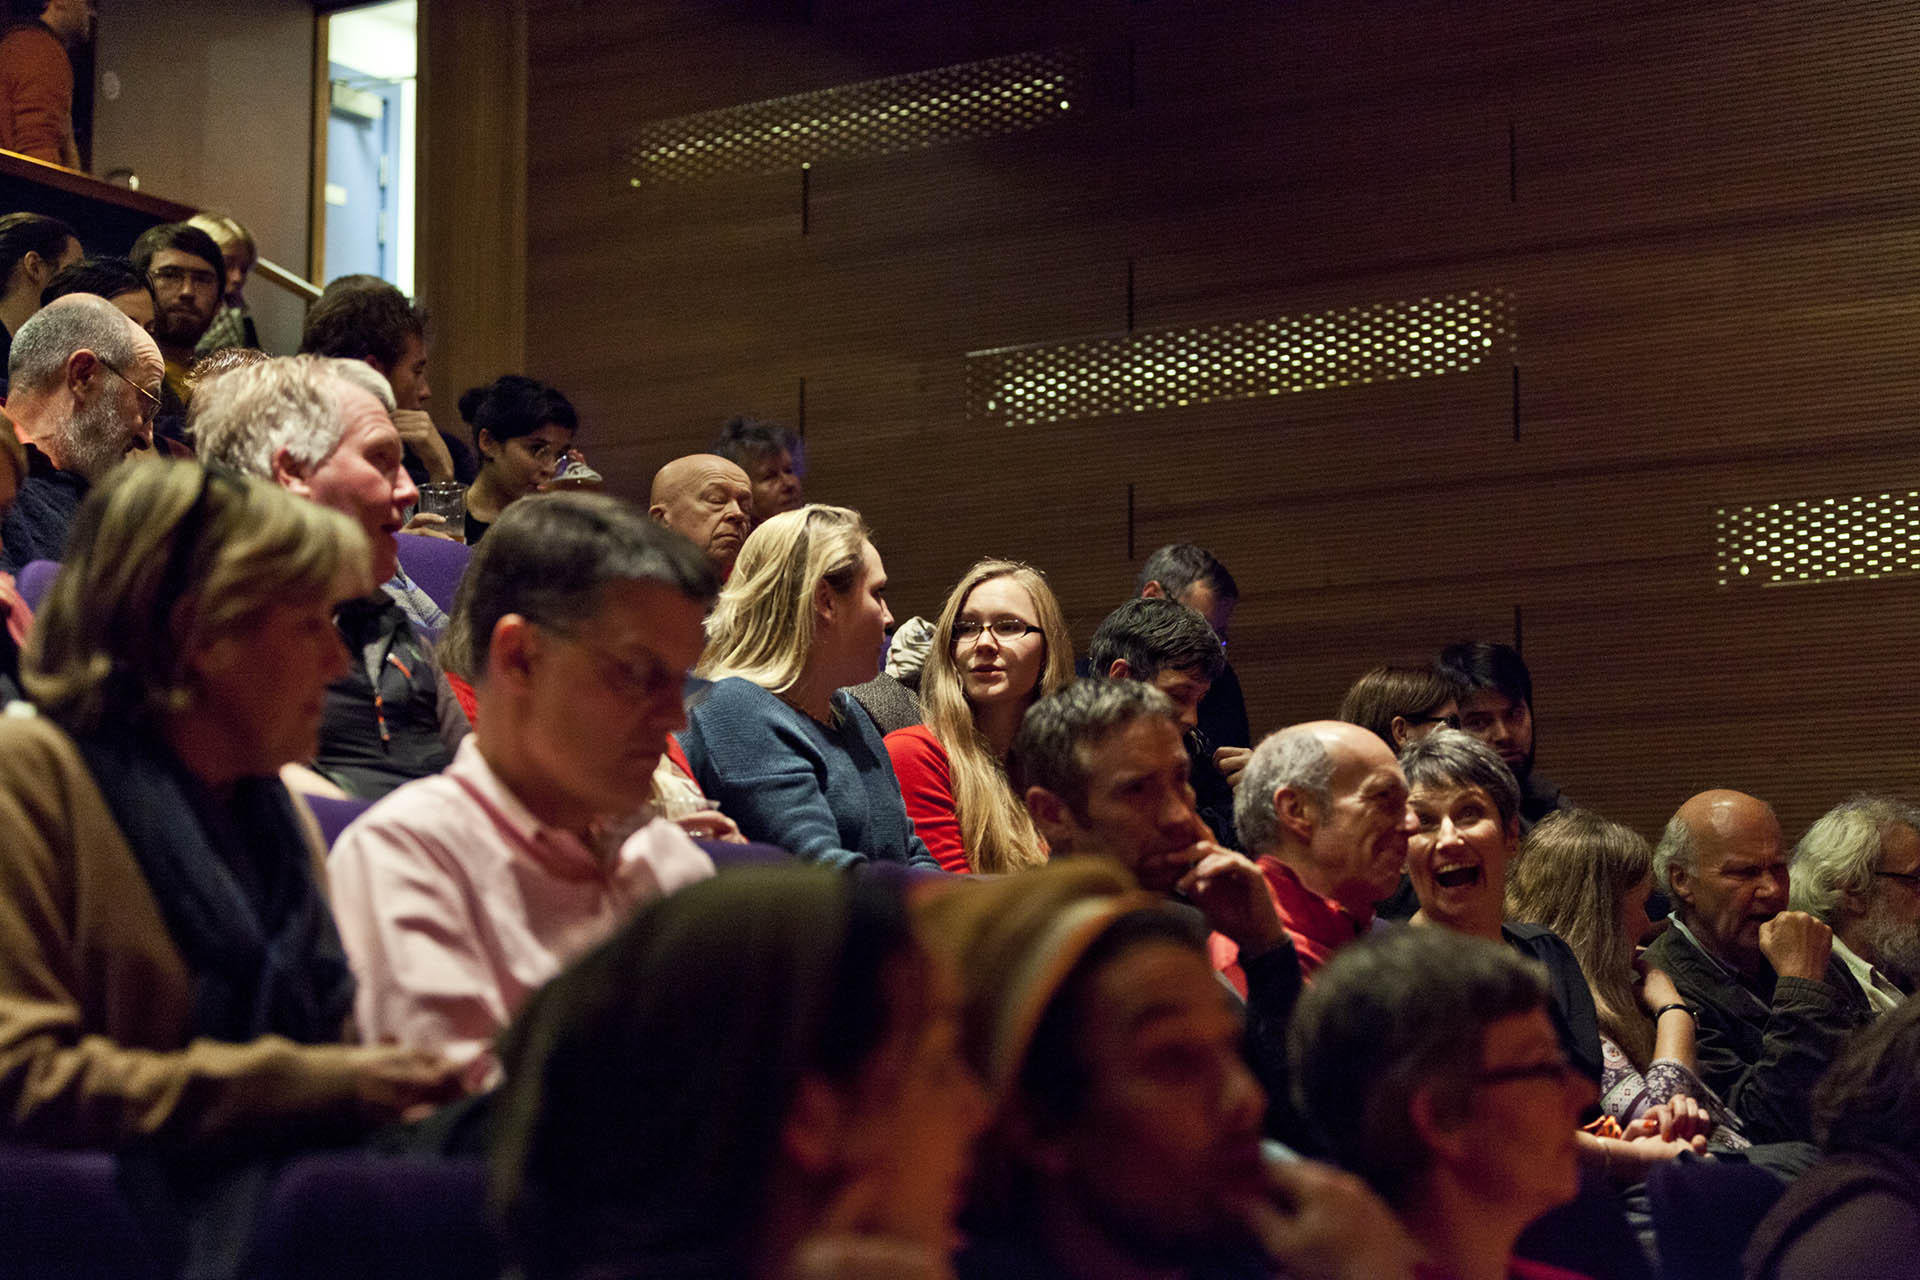 Atmosphere_Audience_Credit Solen Collet